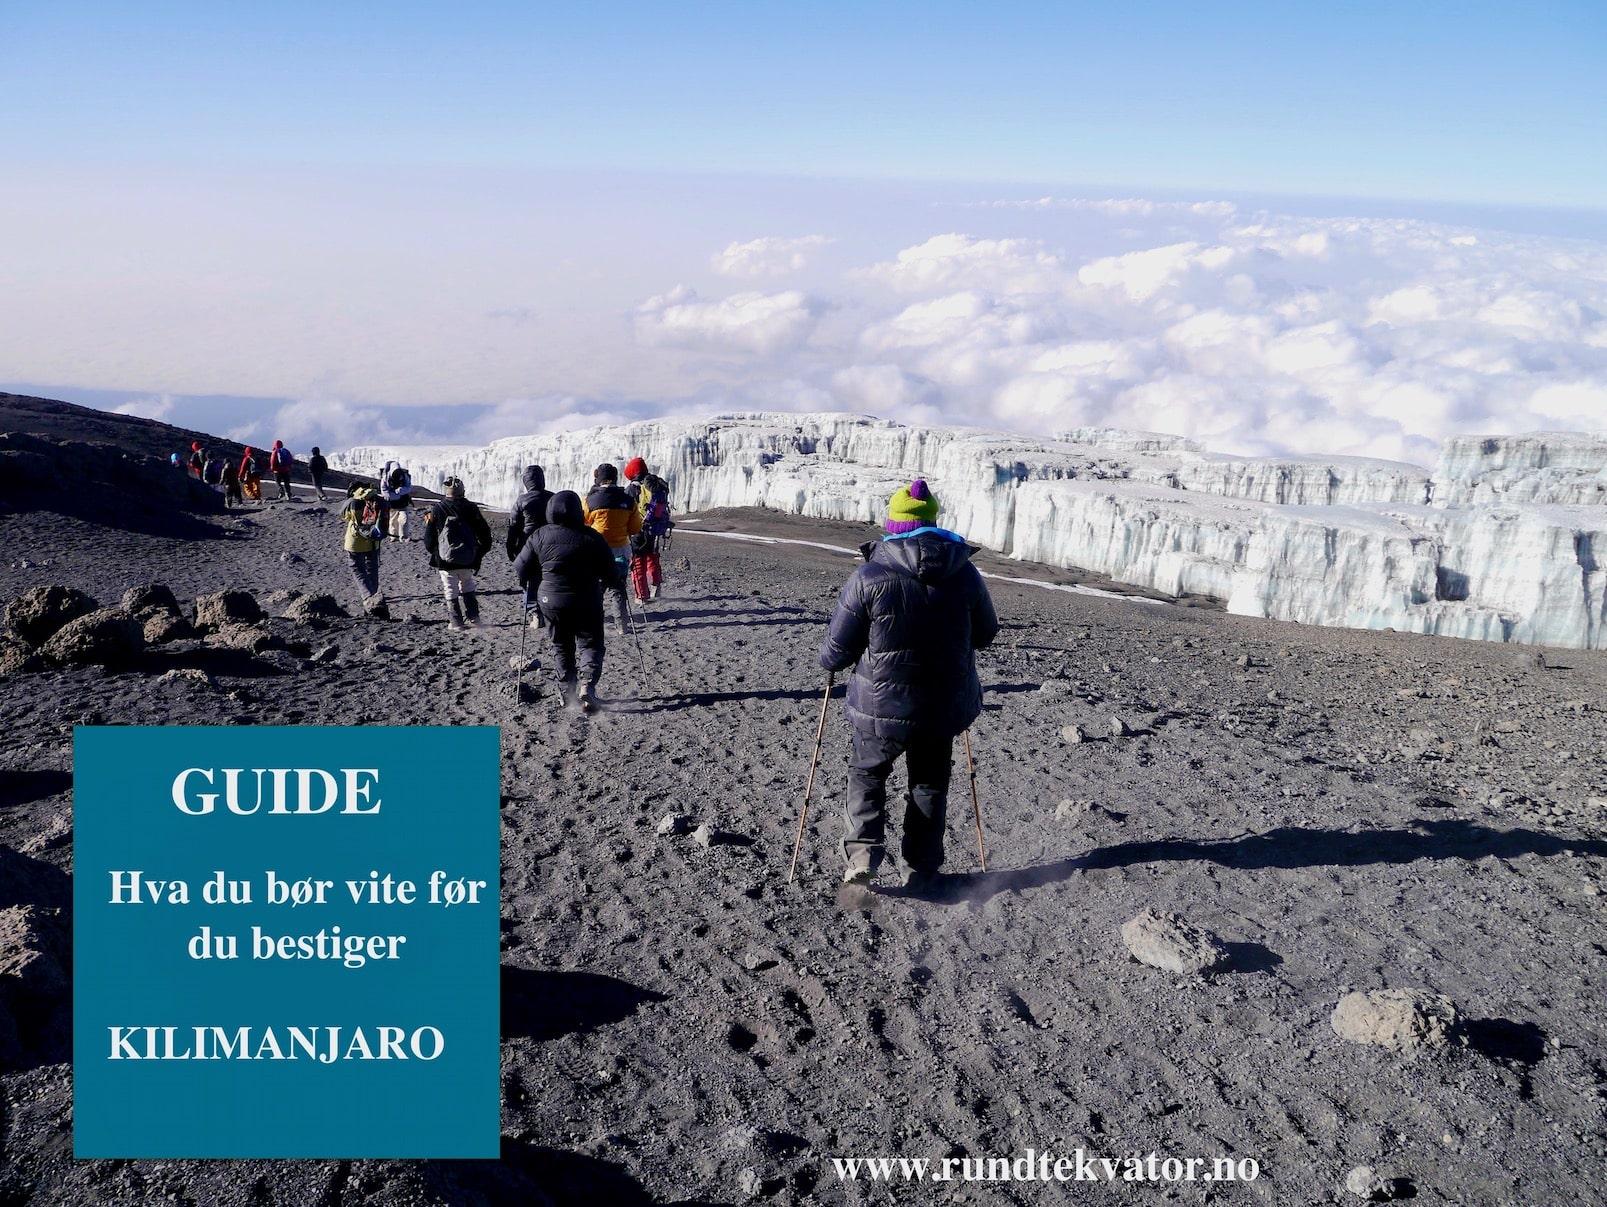 Guide til Kilimanjaro